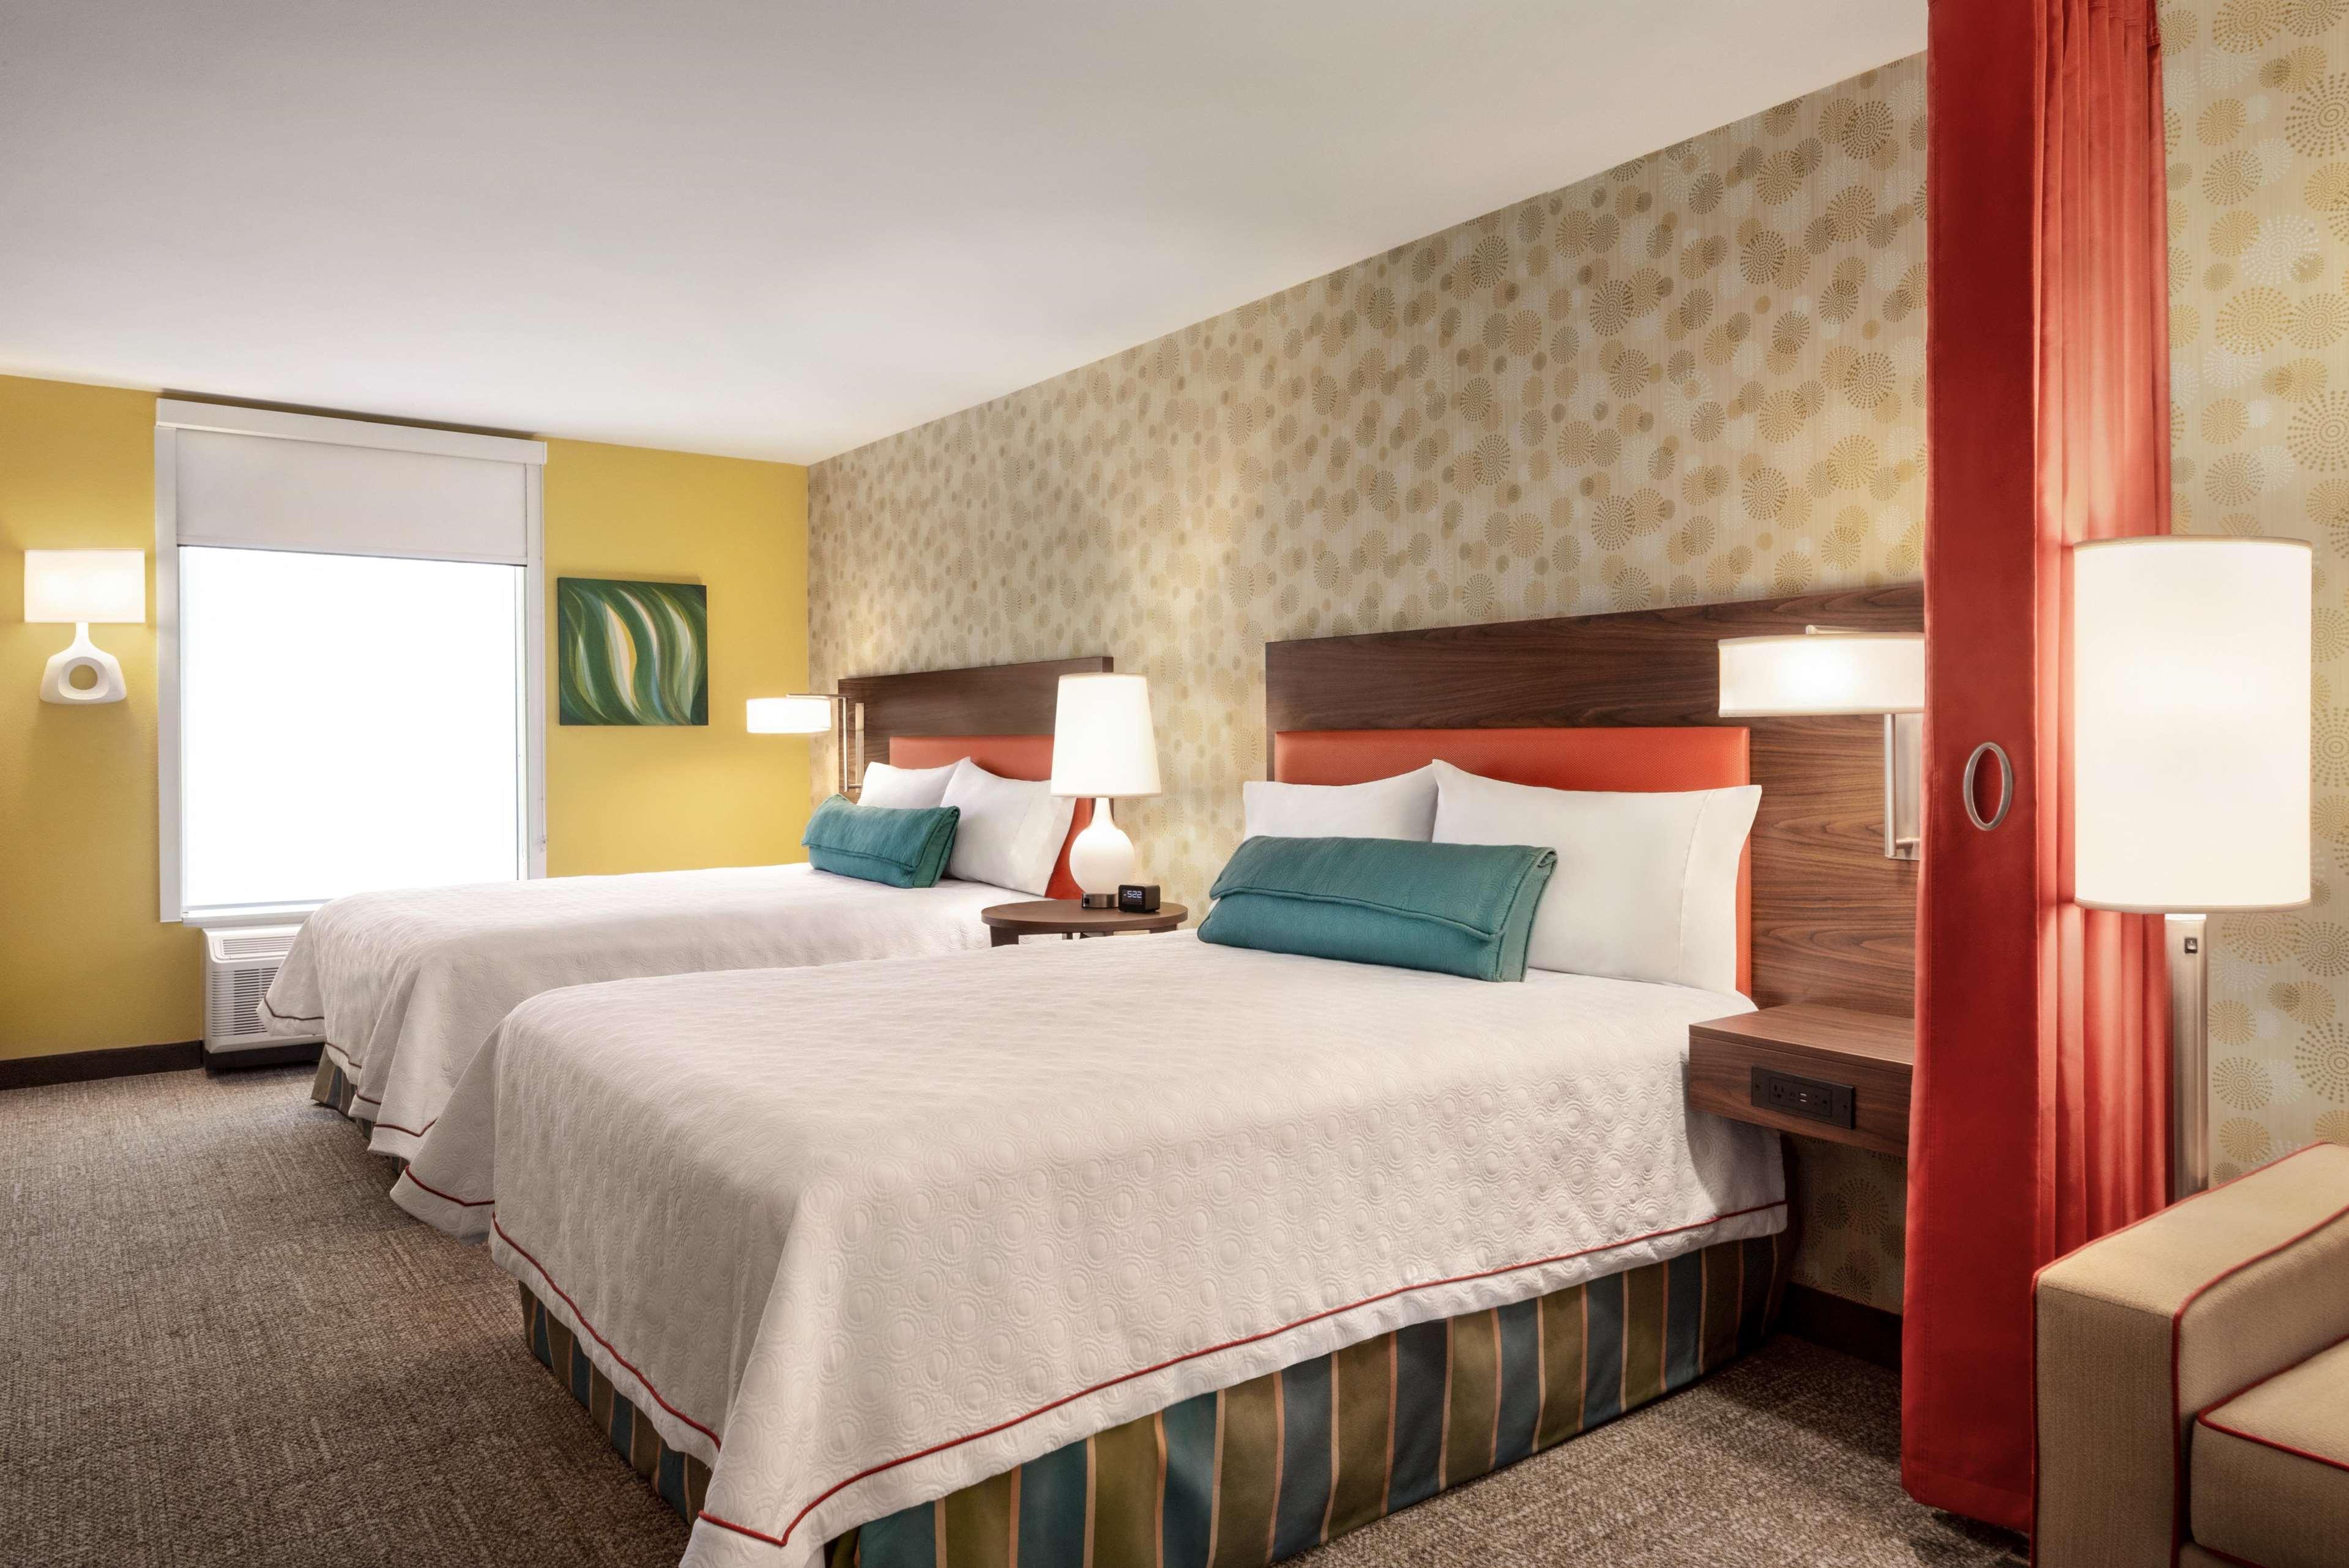 Home2 Suites by Hilton Waco image 10